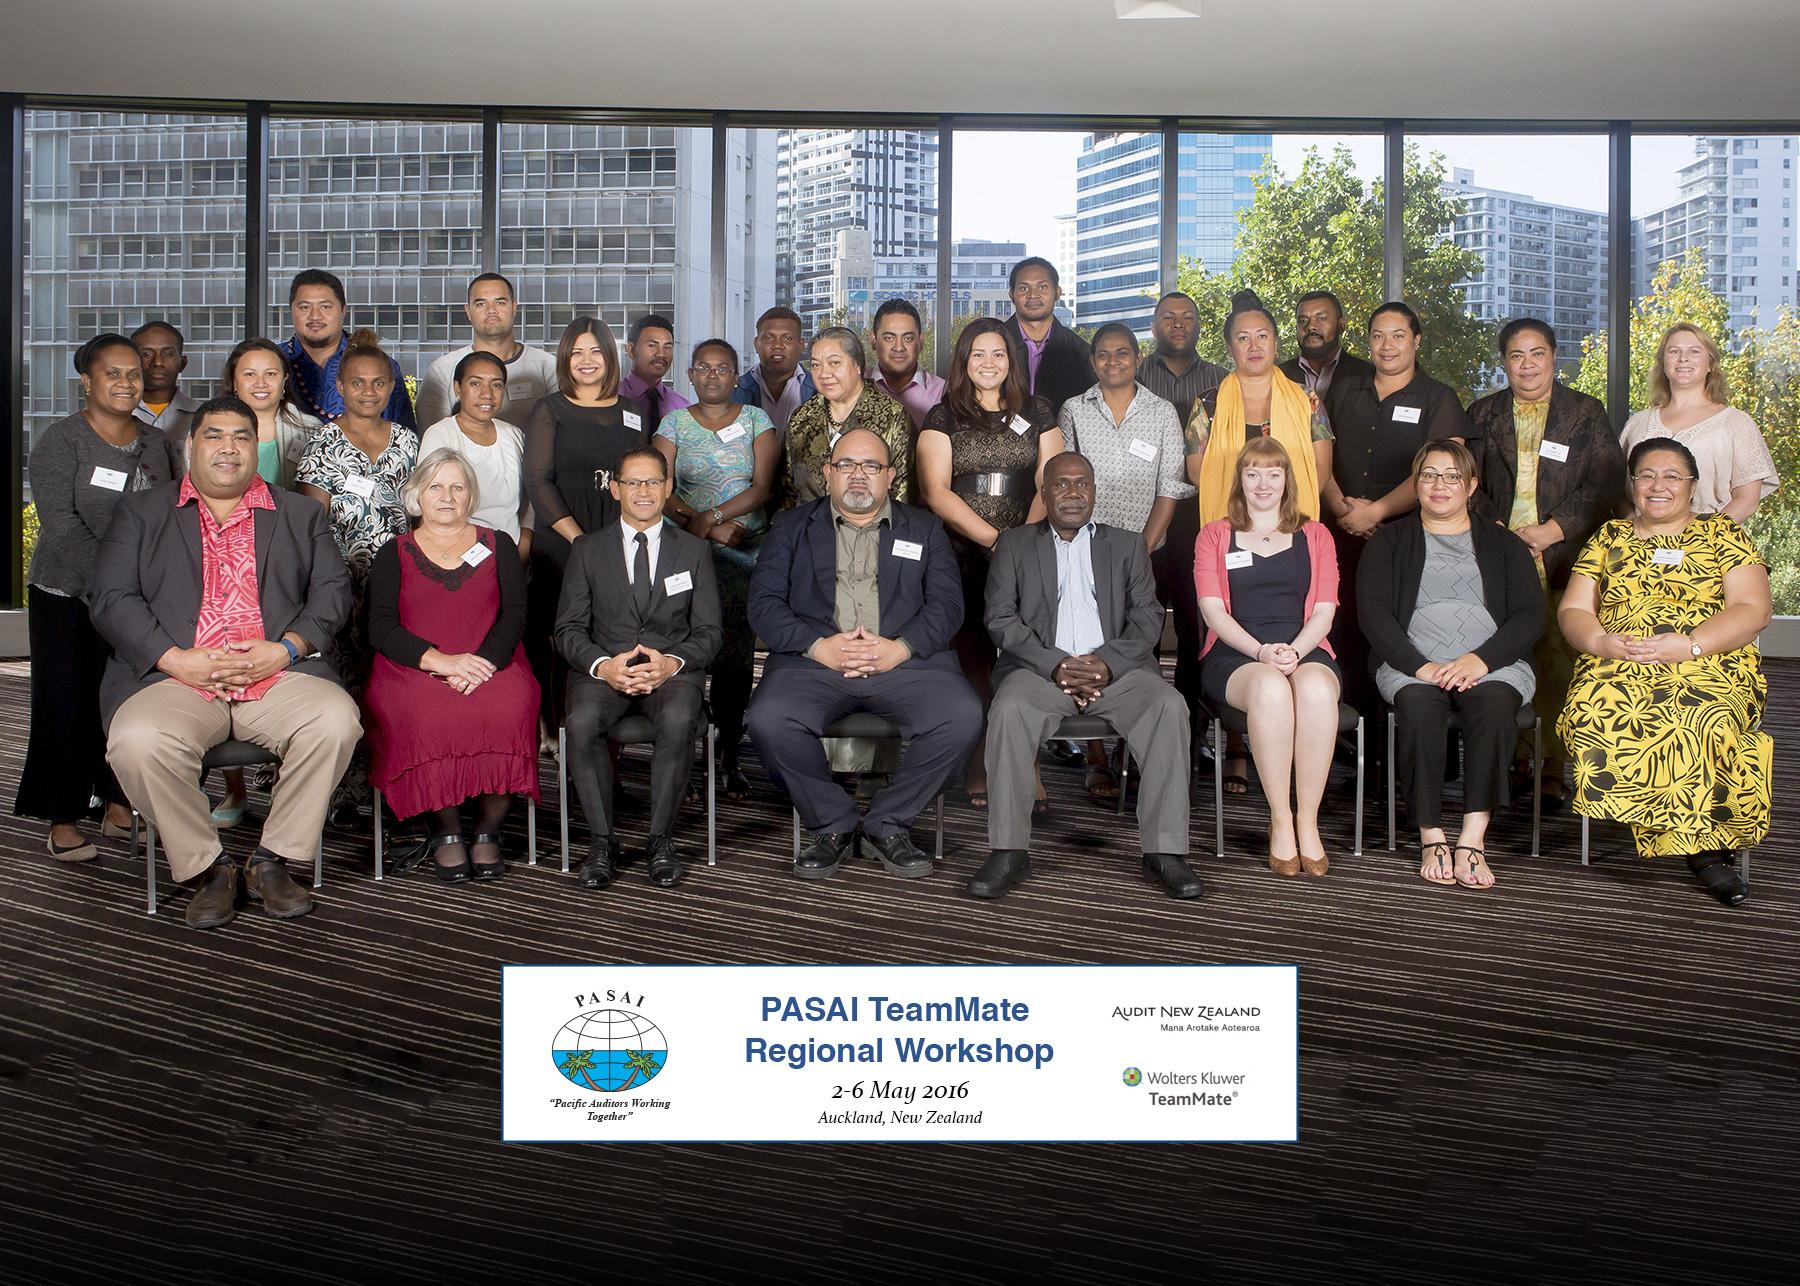 Photo 1: PASAI TeamMate® forum participants in Auckland